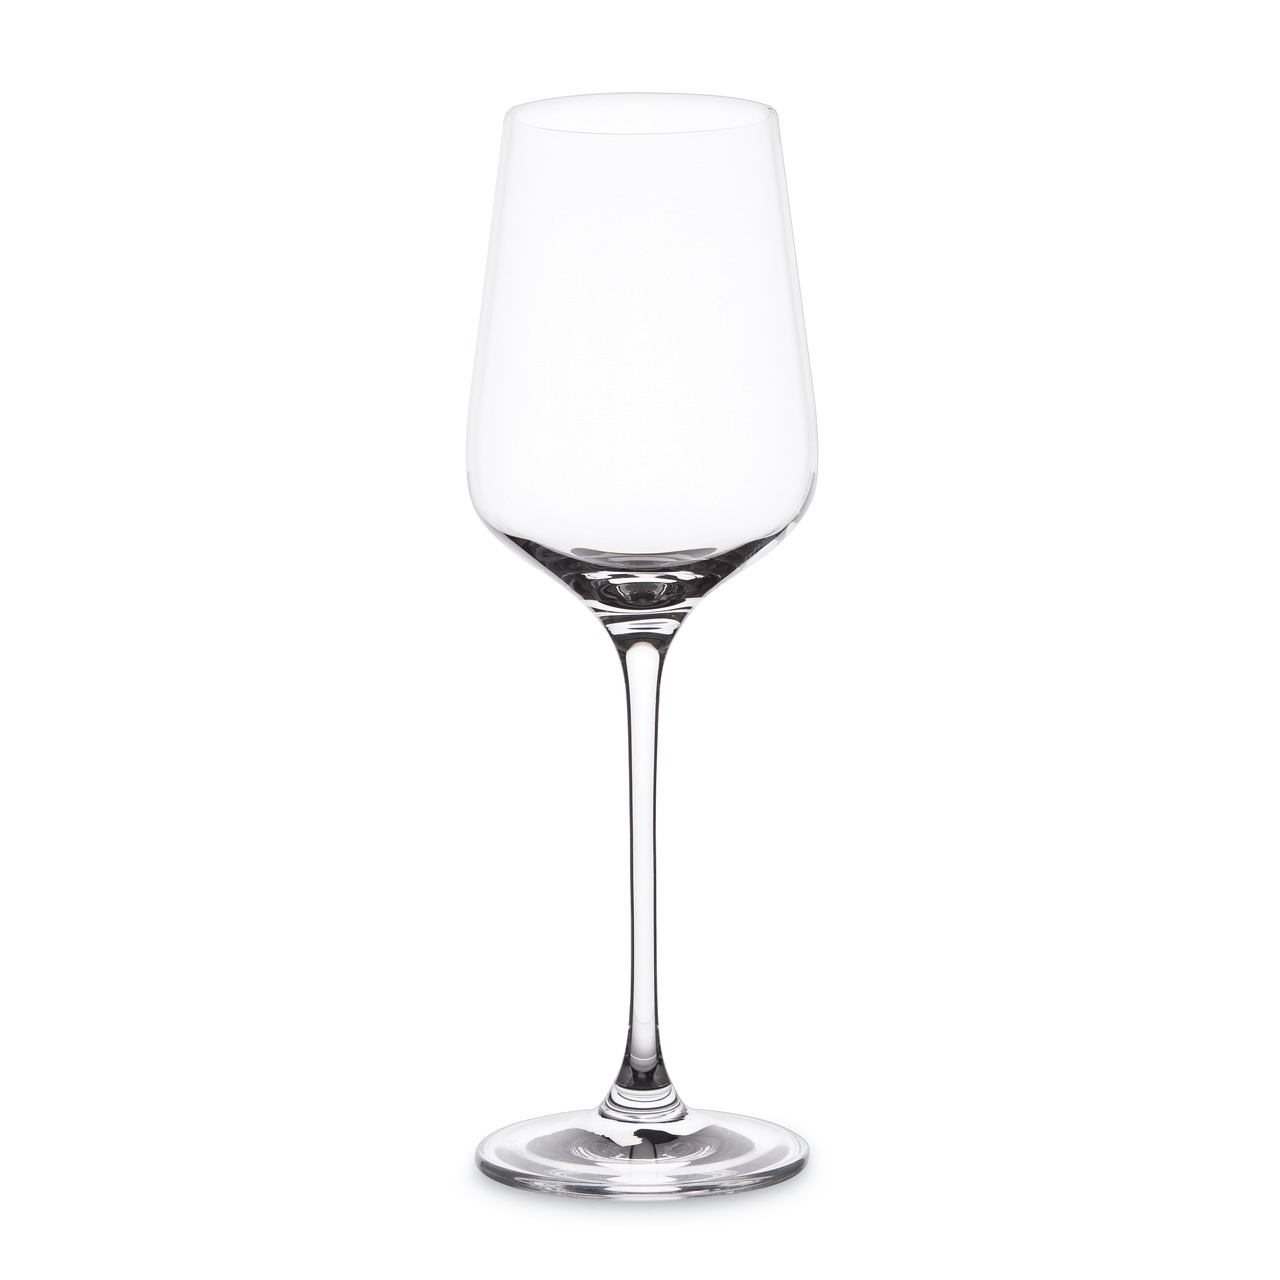 Набор из 6 бокалов для белого вина 350мл BergHOFF Chateau 1701601Бокалы и стаканы<br><br>